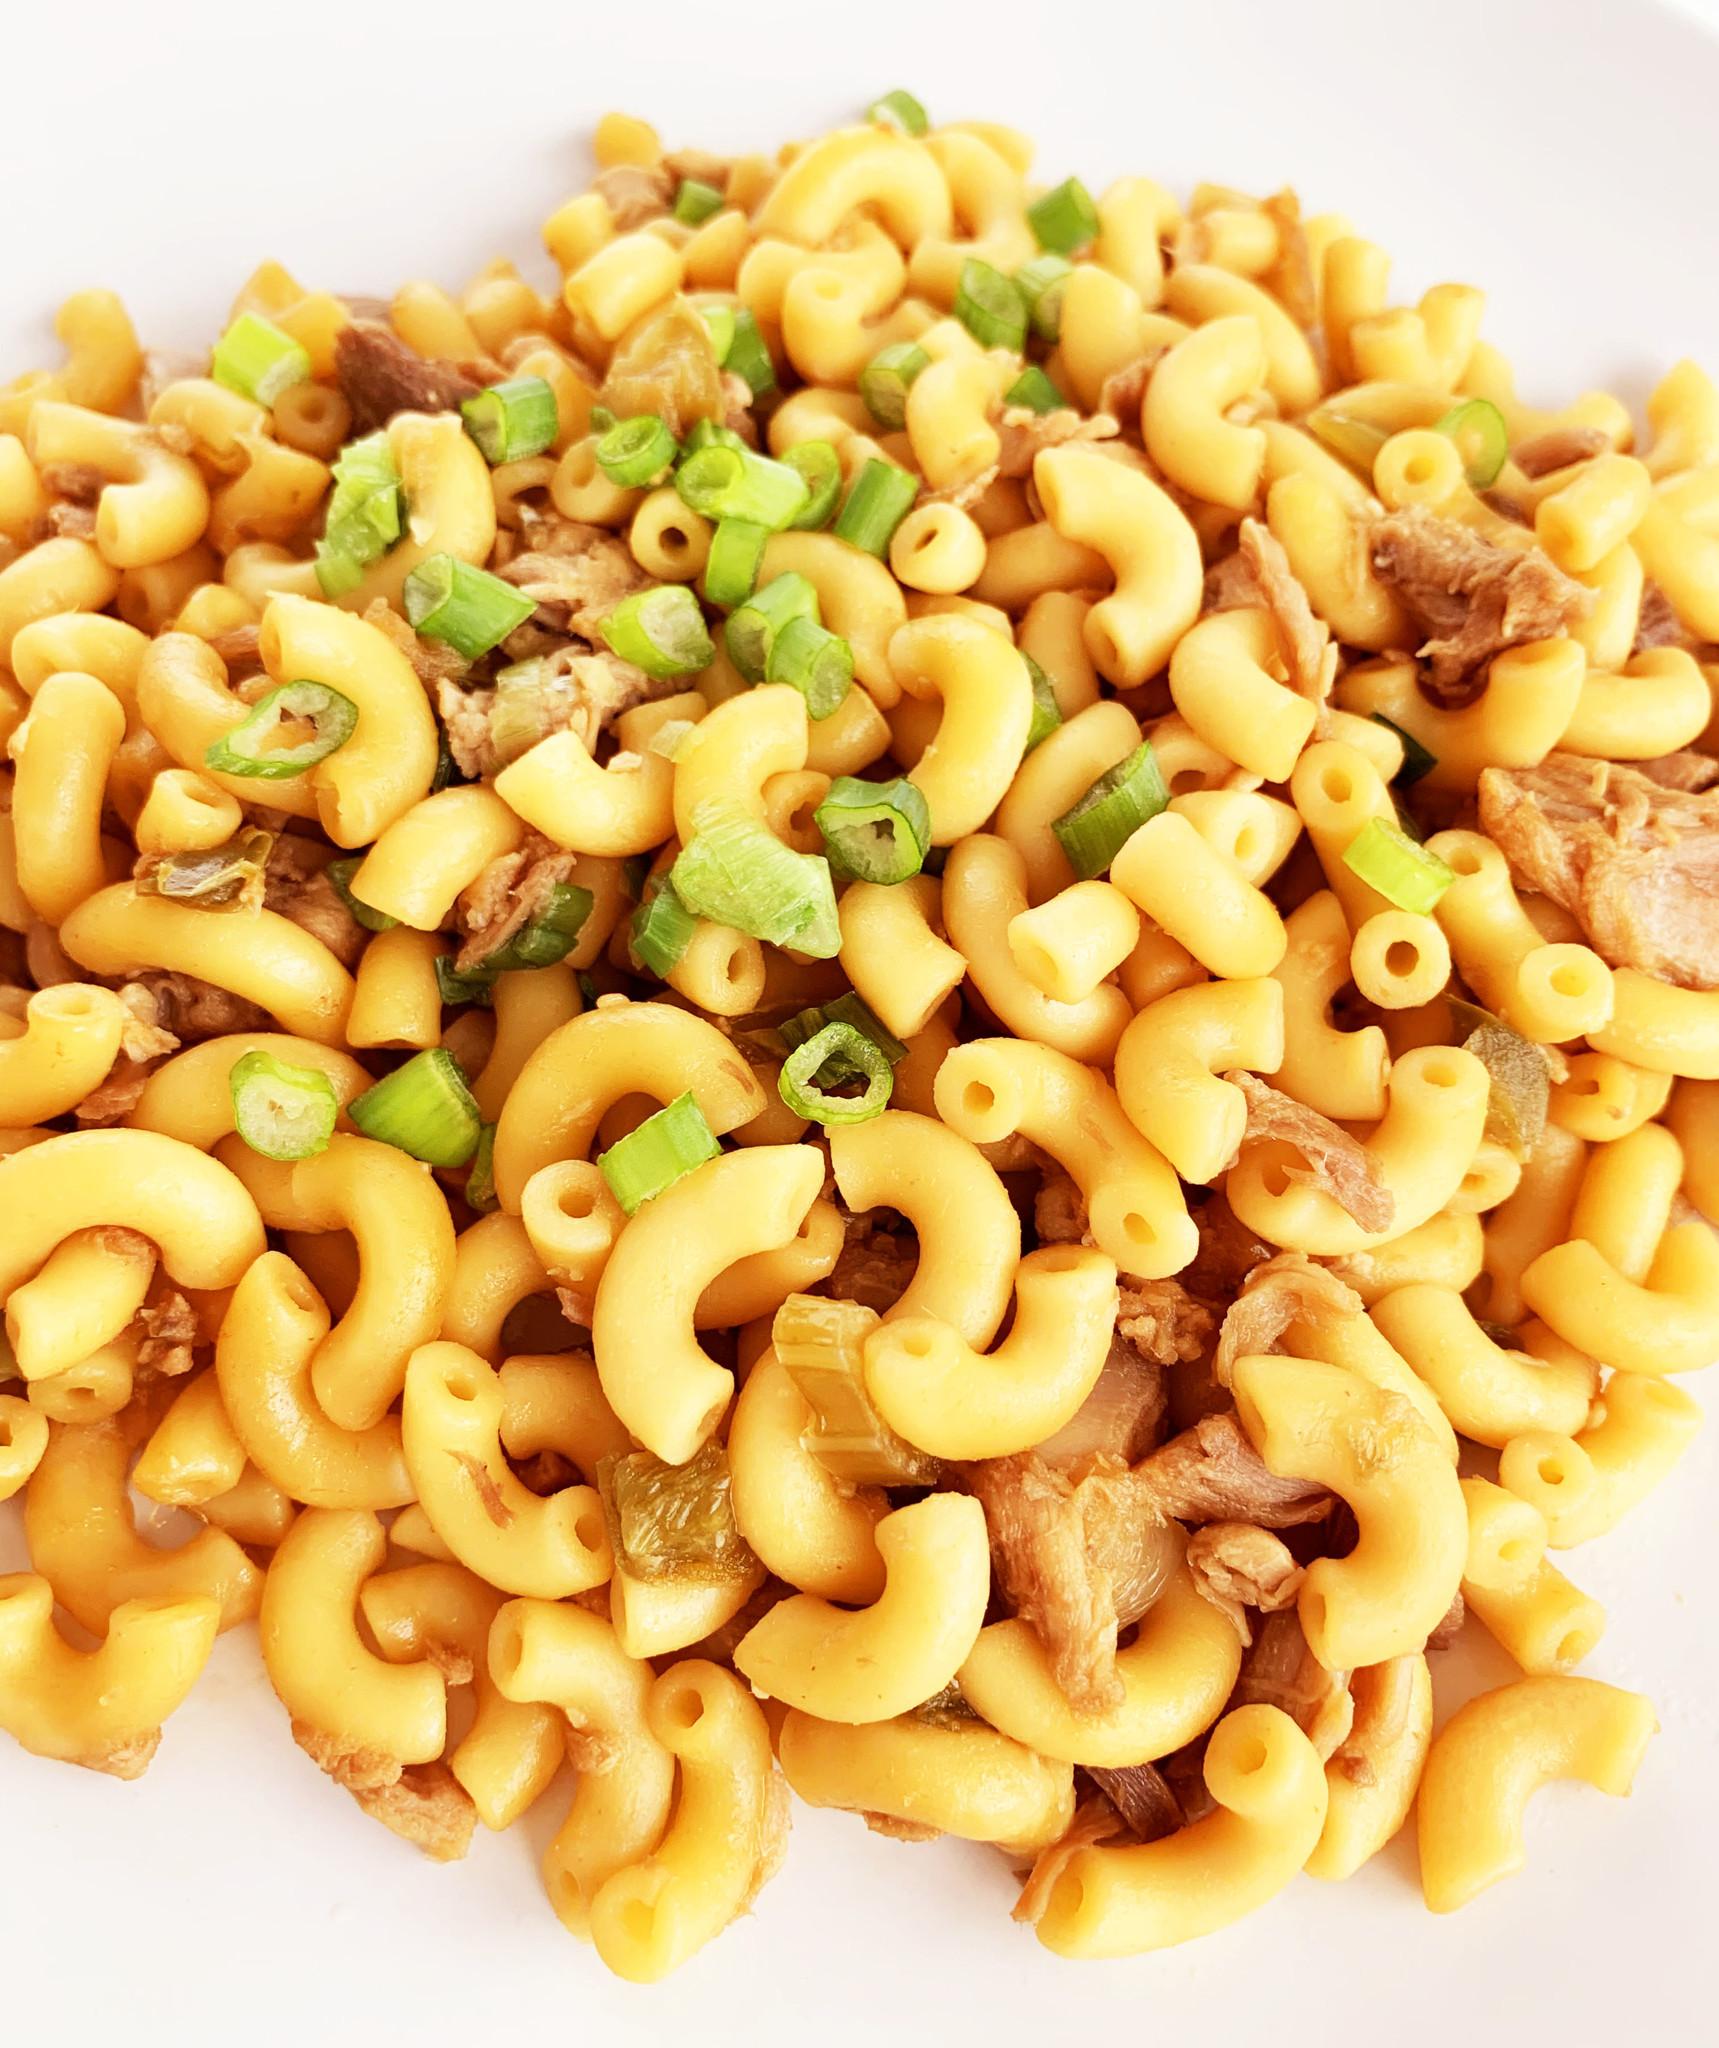 Nouilles chinoises (175 g)